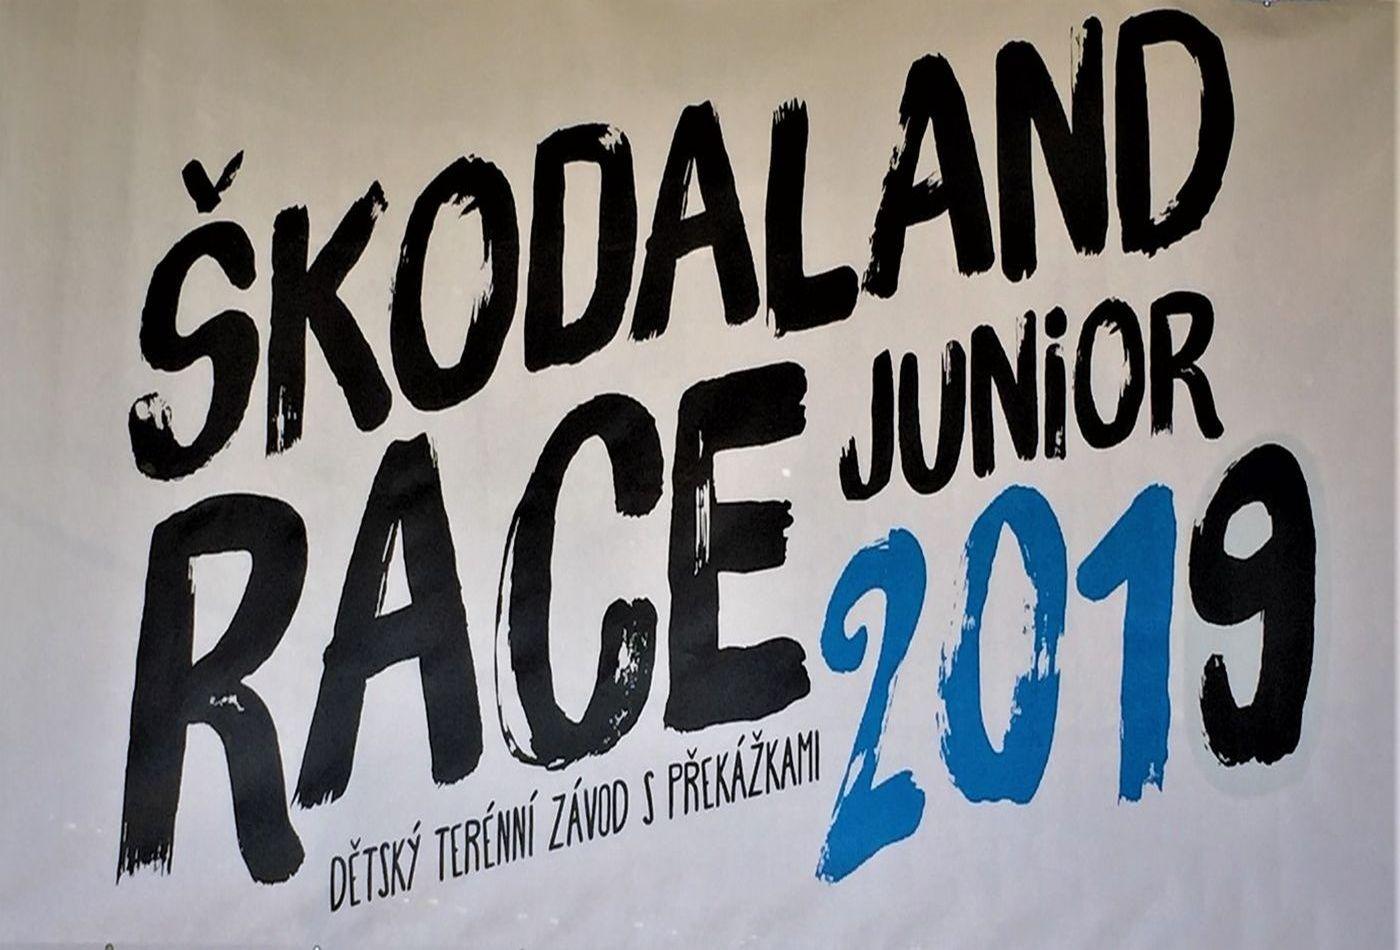 Škodaland-Race-Junior-623-1